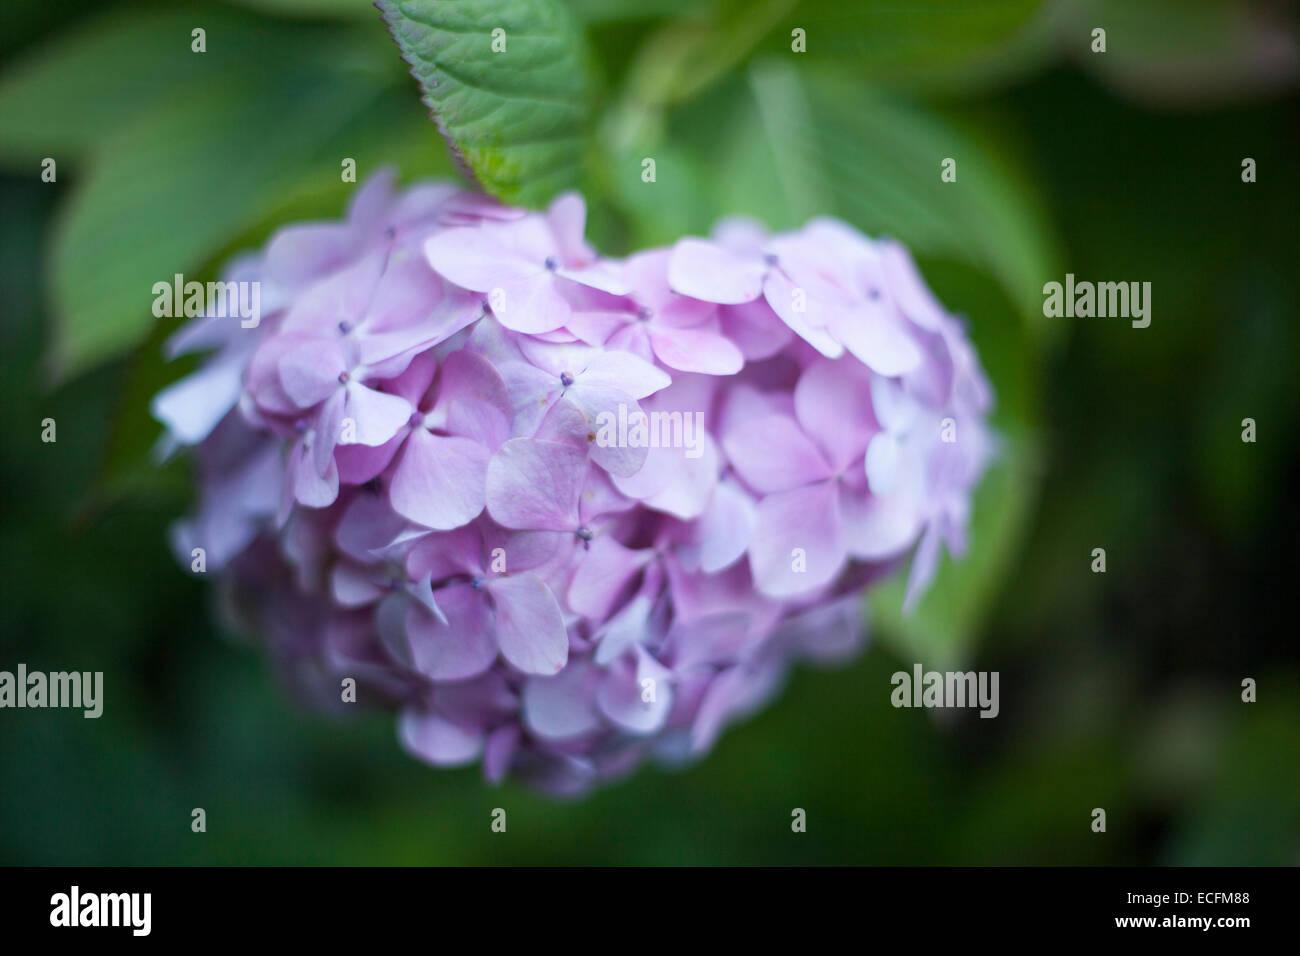 Pink Hydrangea Head - Stock Image